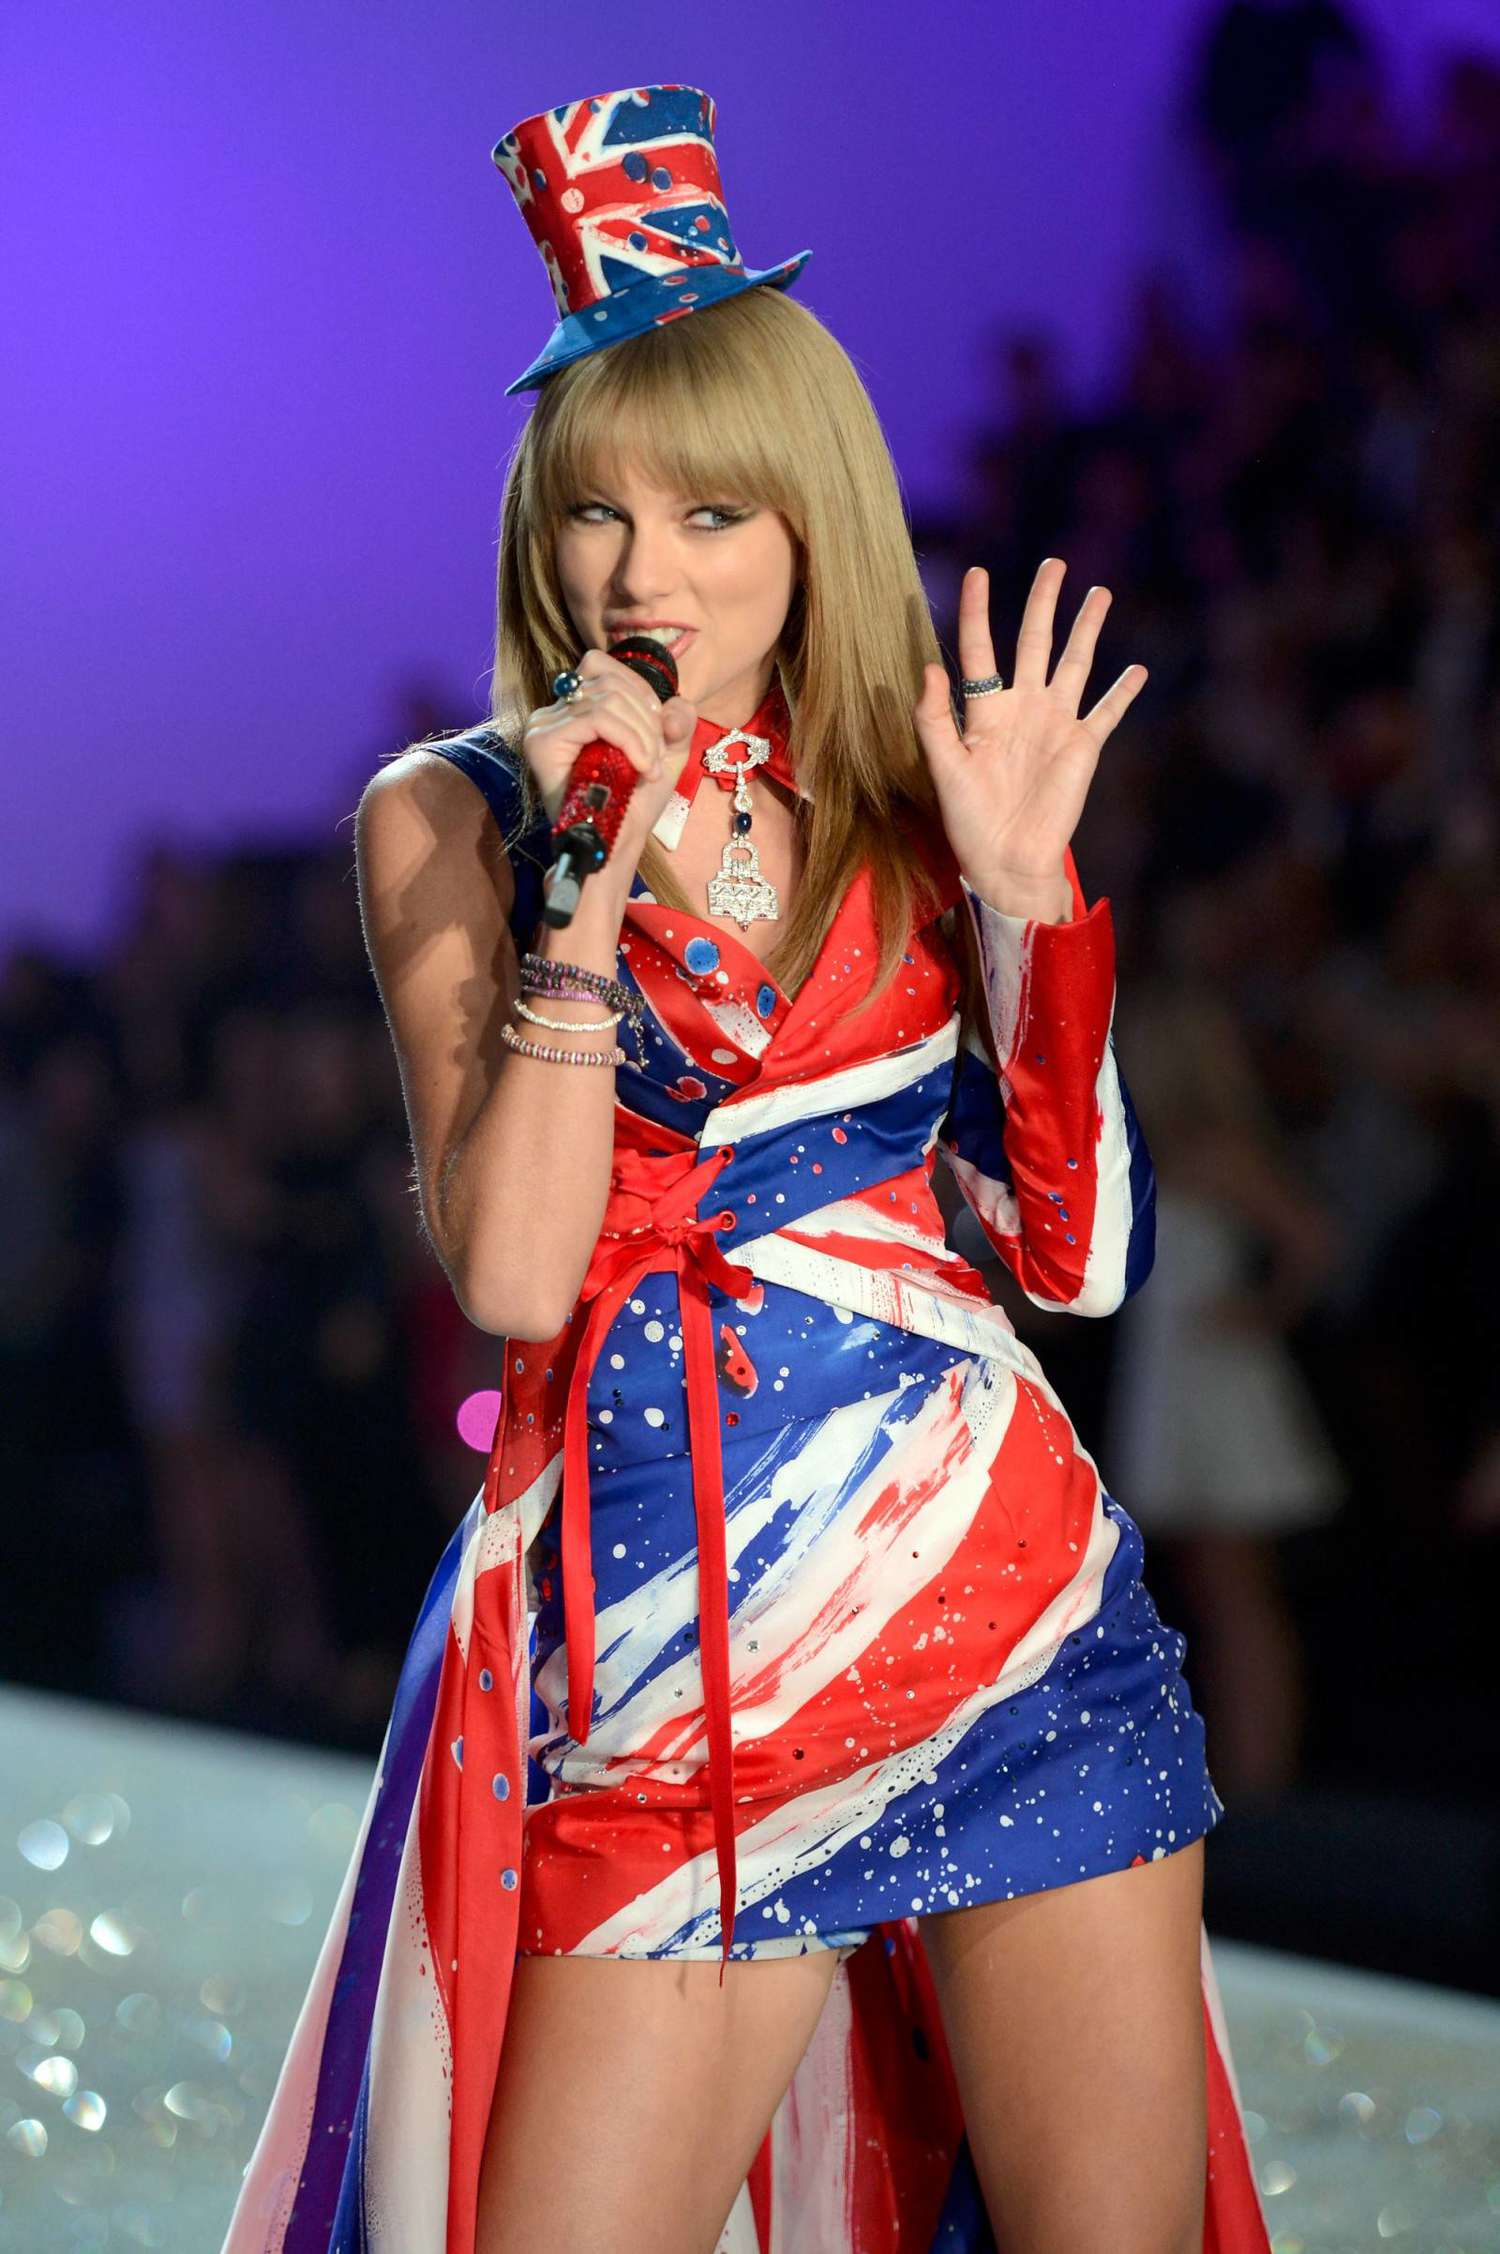 Taylor swift 2013 vs fashion show 22 gotceleb Taylor swift style live vs fashion show